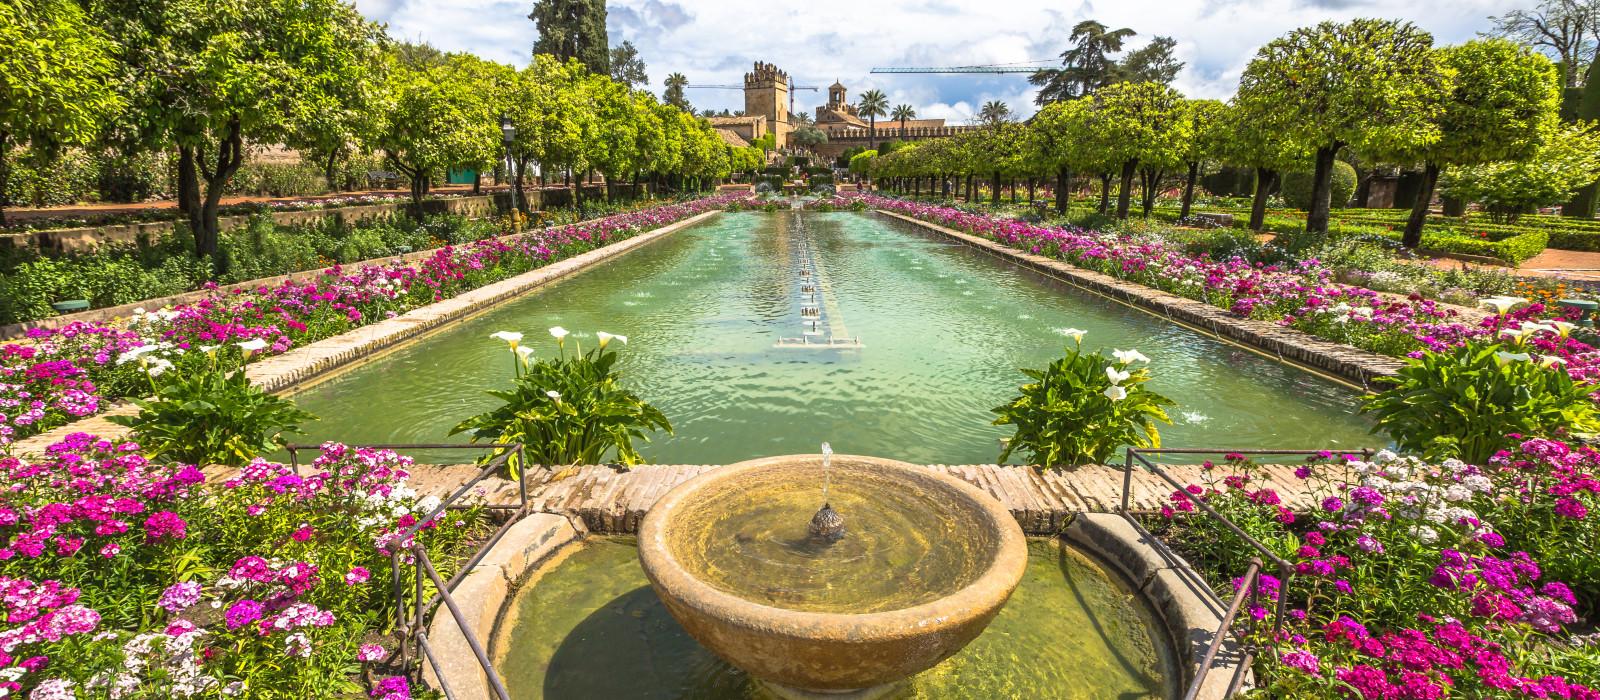 Reiseziel Córdoba Spanien